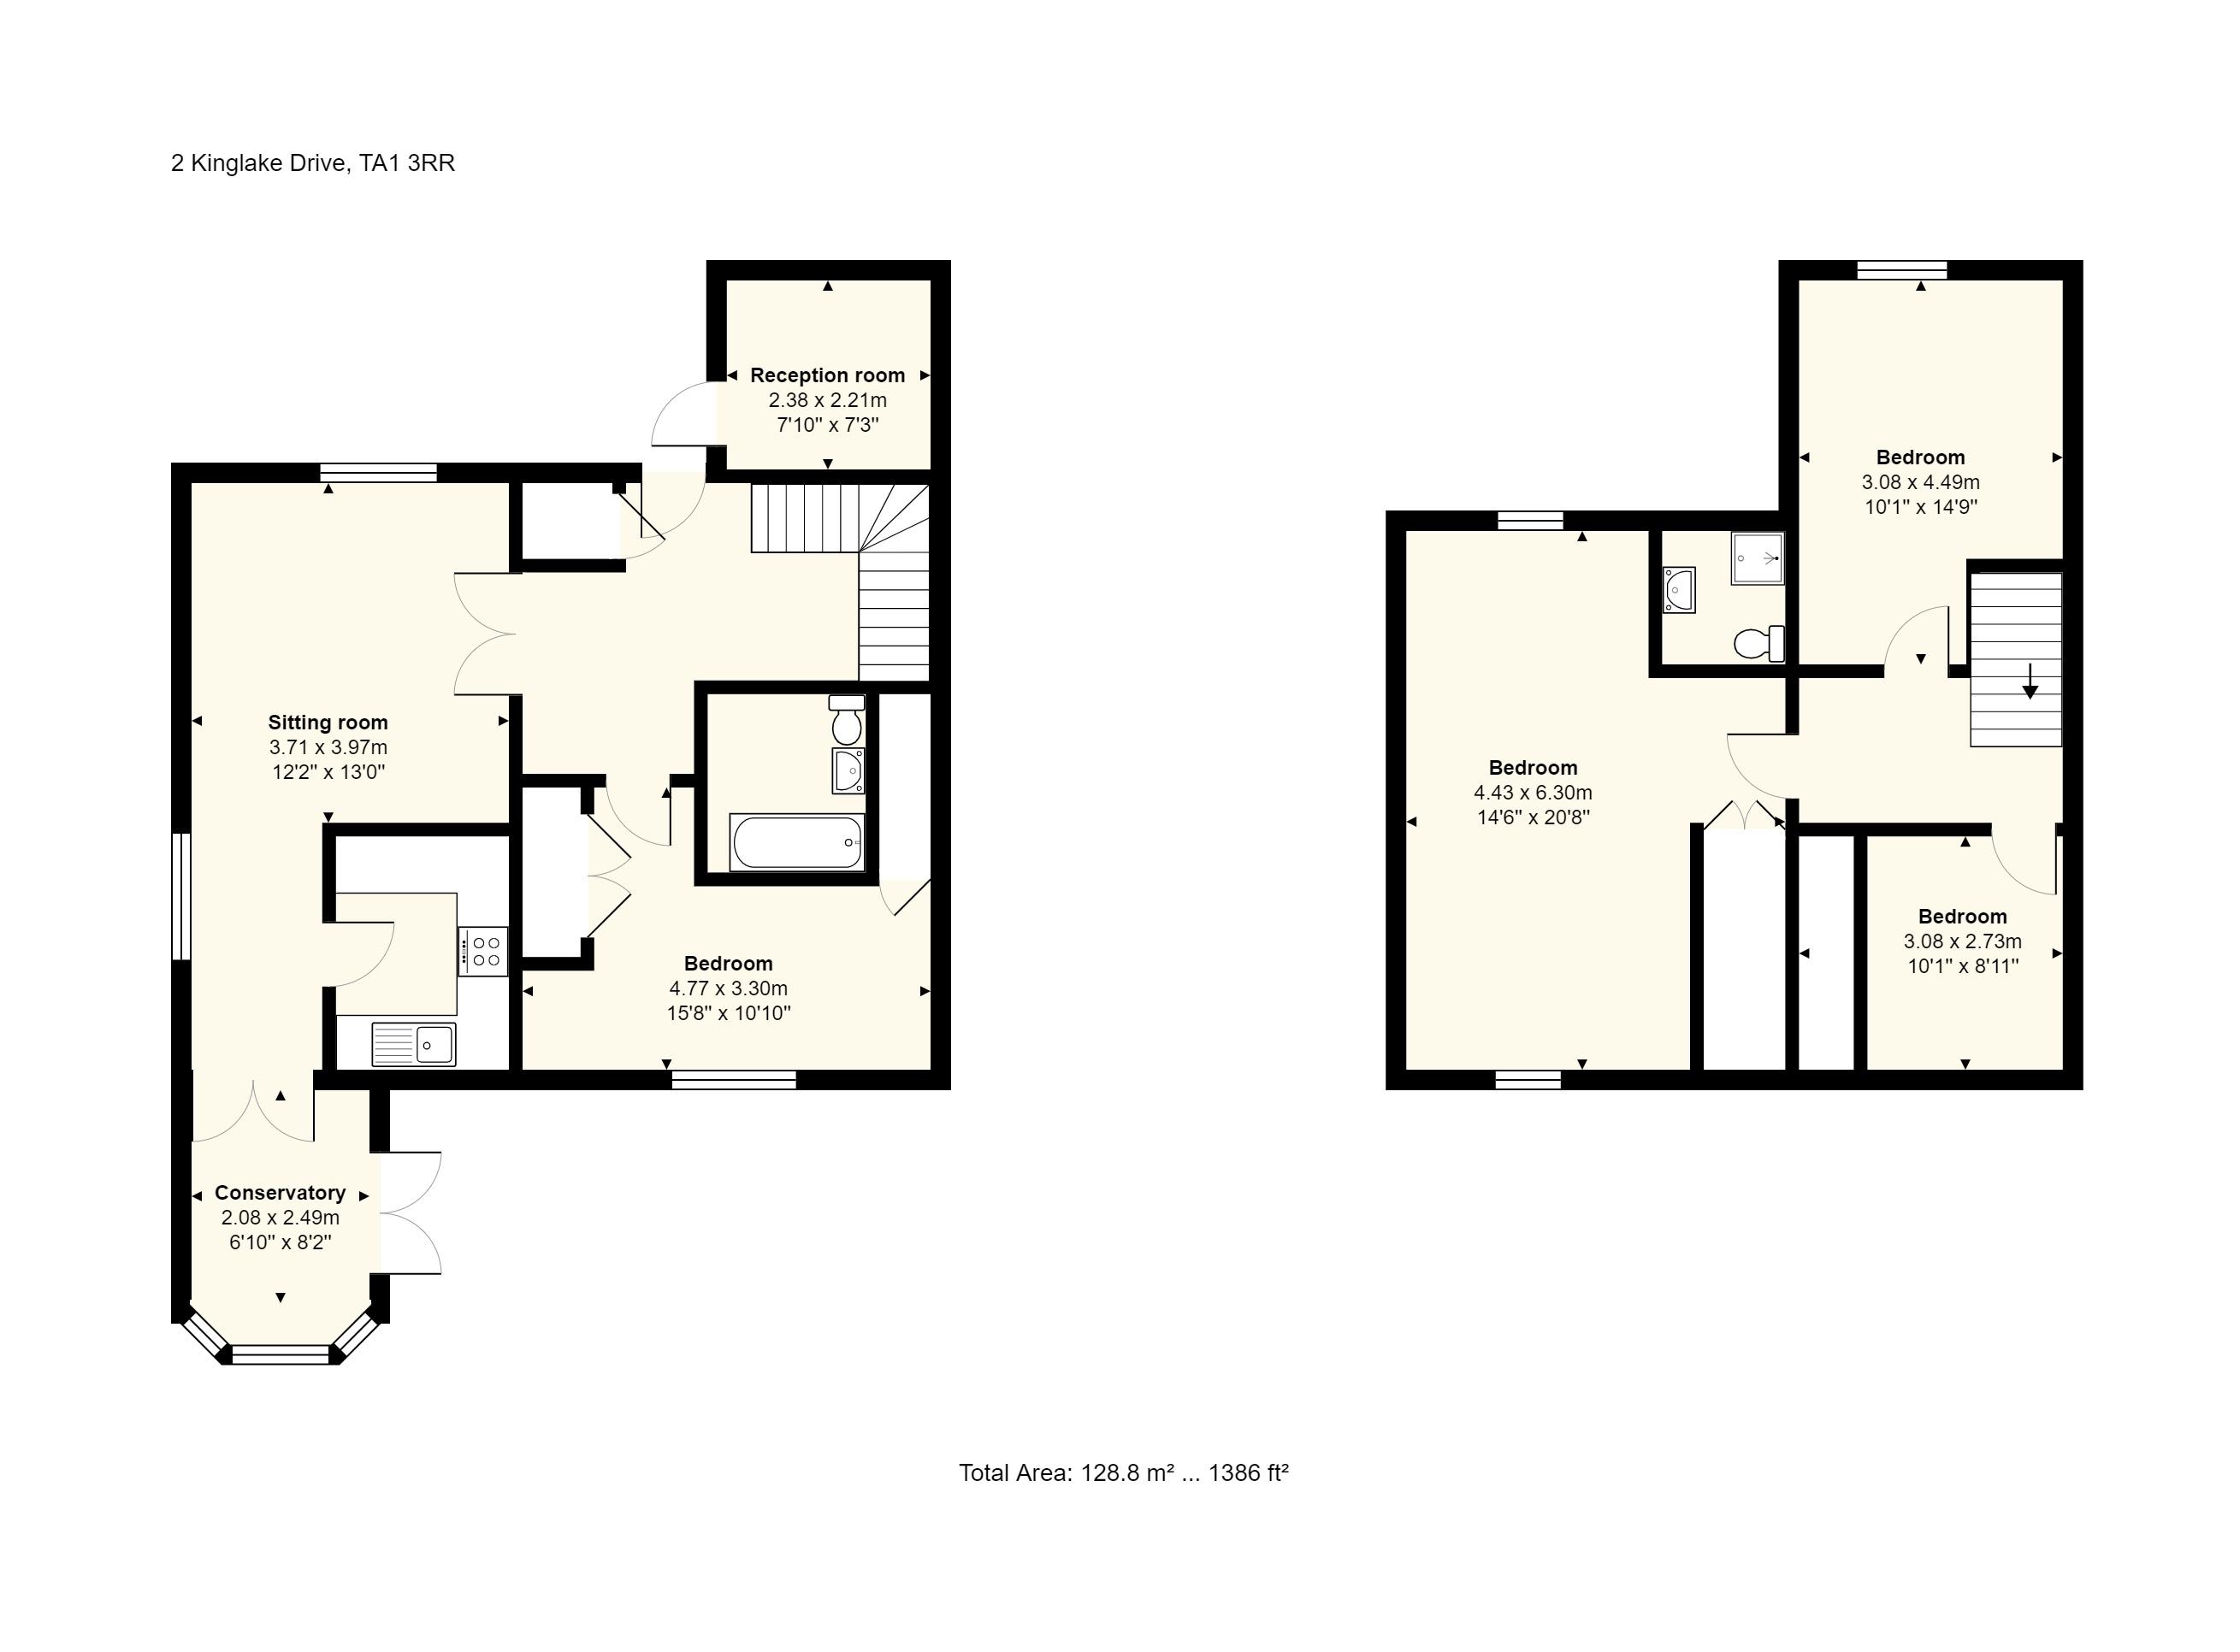 2 Kinglake Drive Floorplan